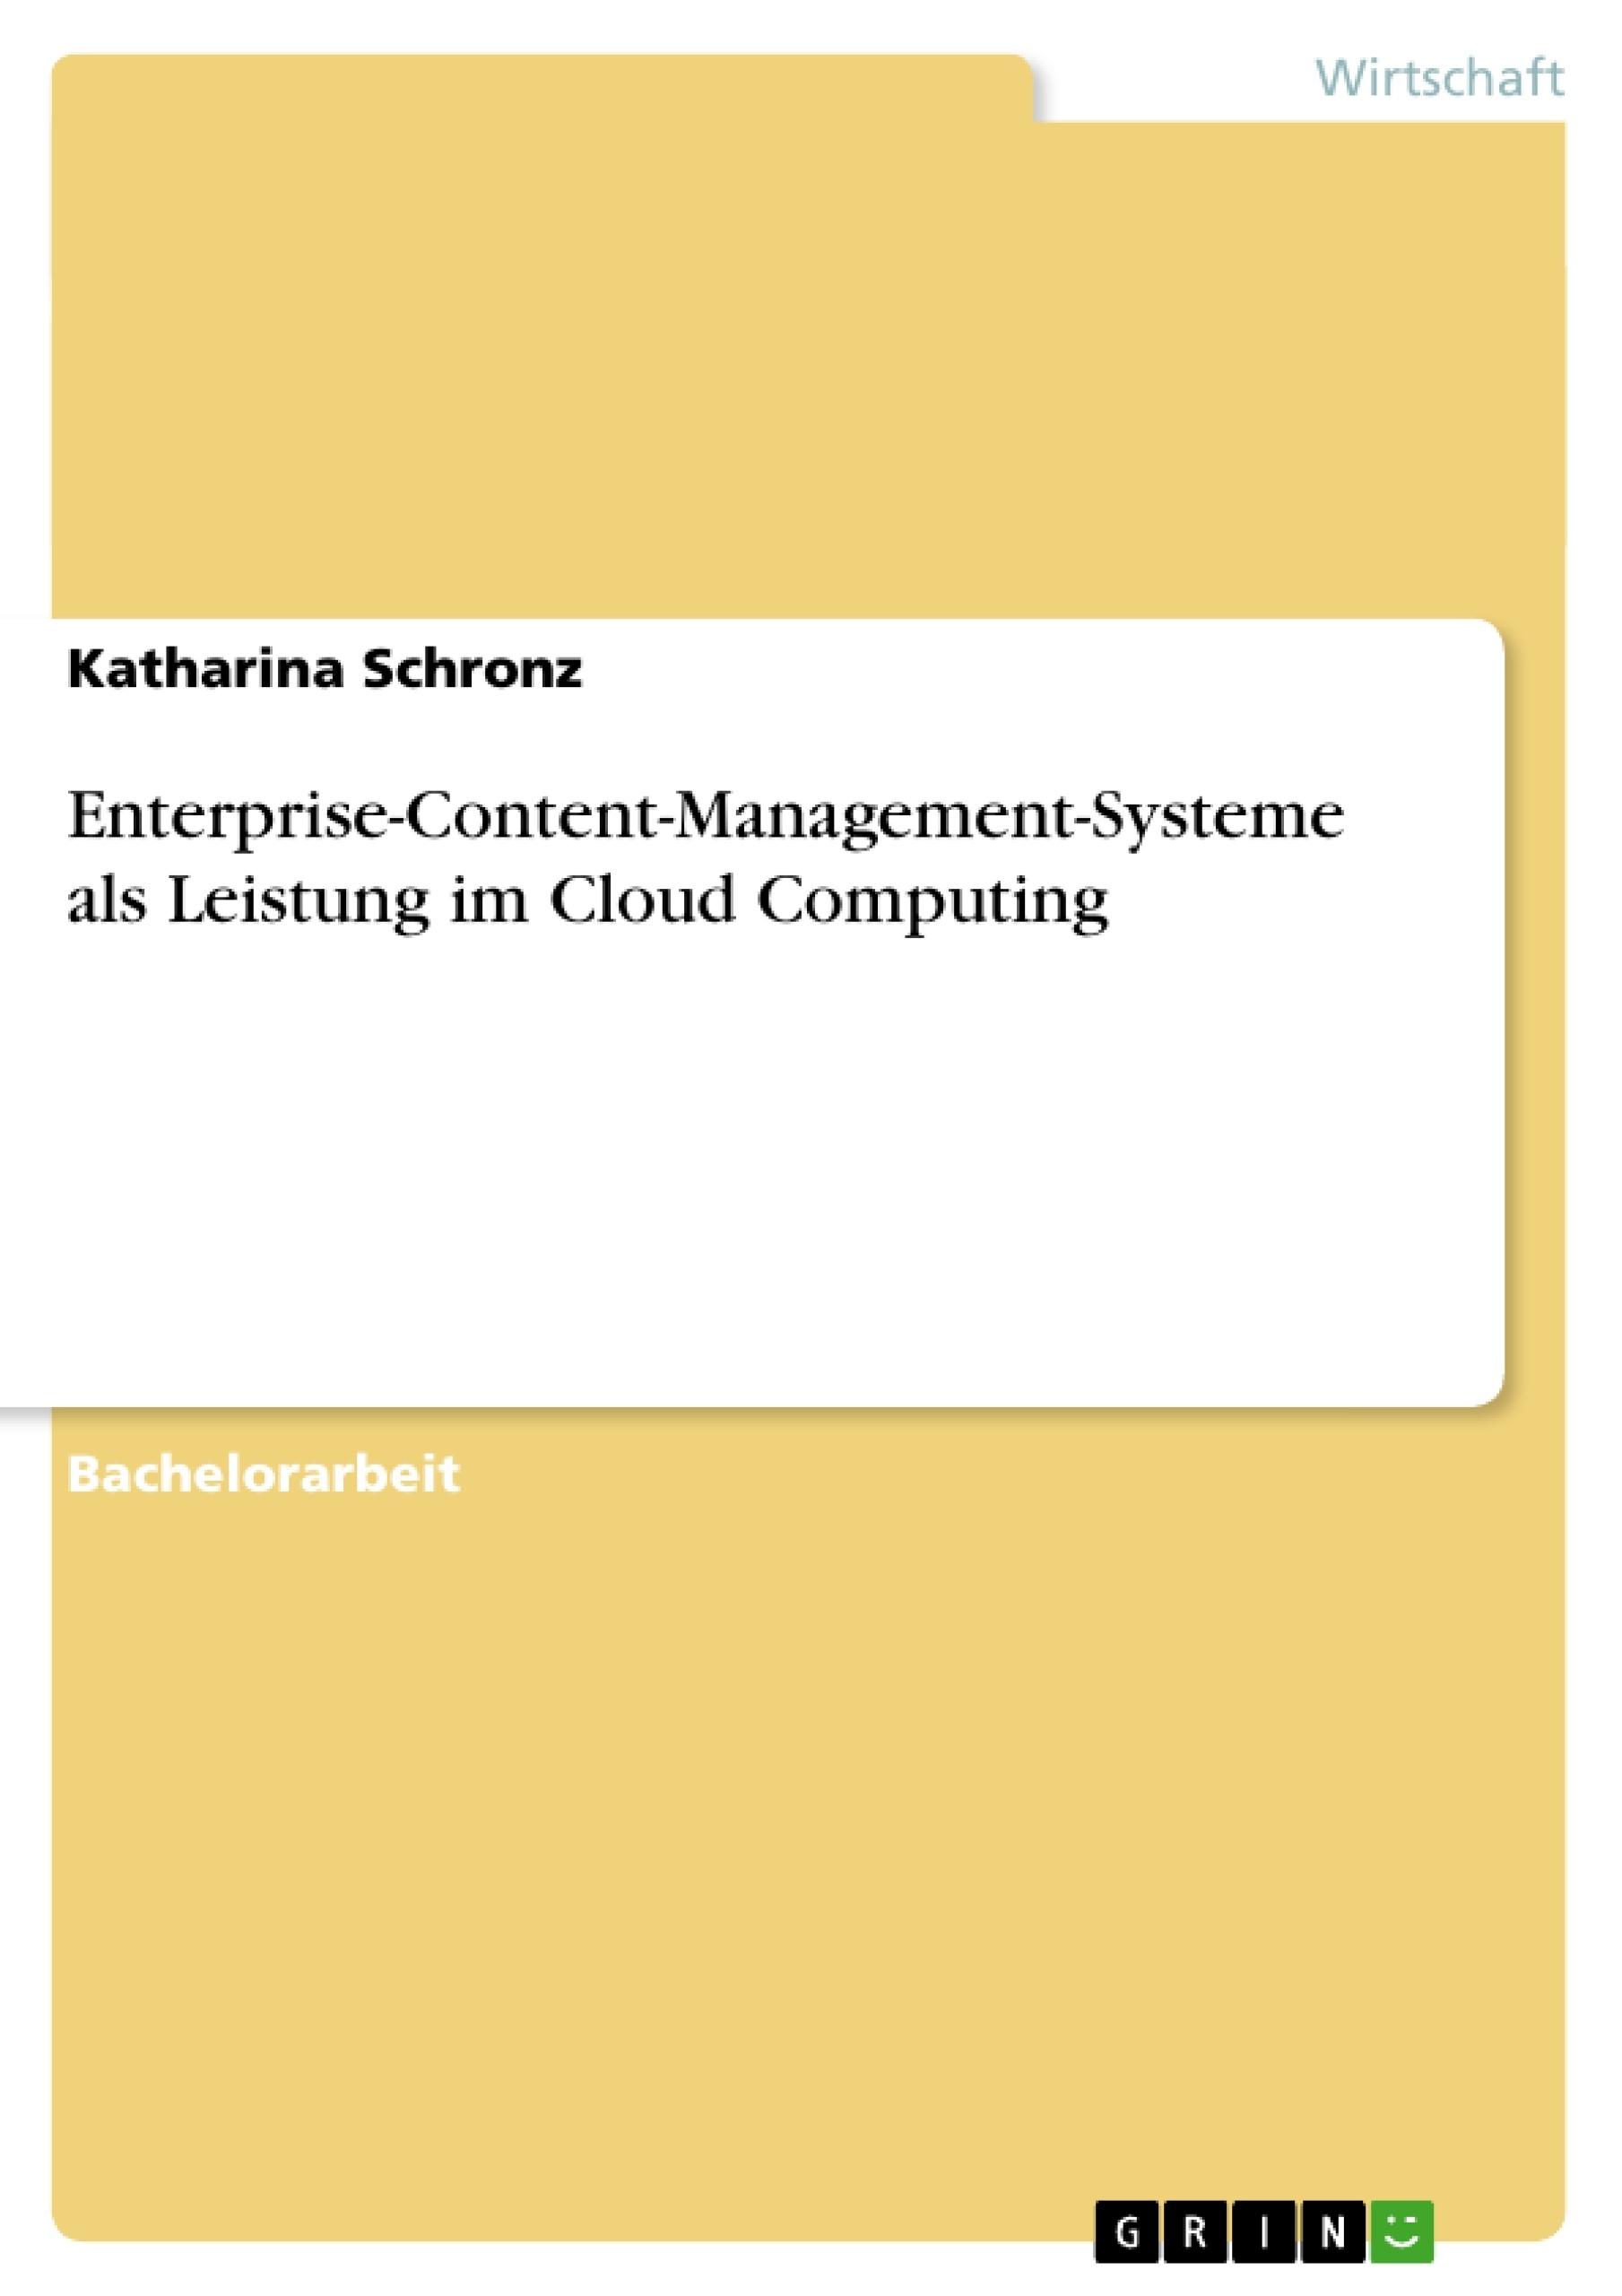 Titel: Enterprise-Content-Management-Systeme als Leistung im Cloud Computing